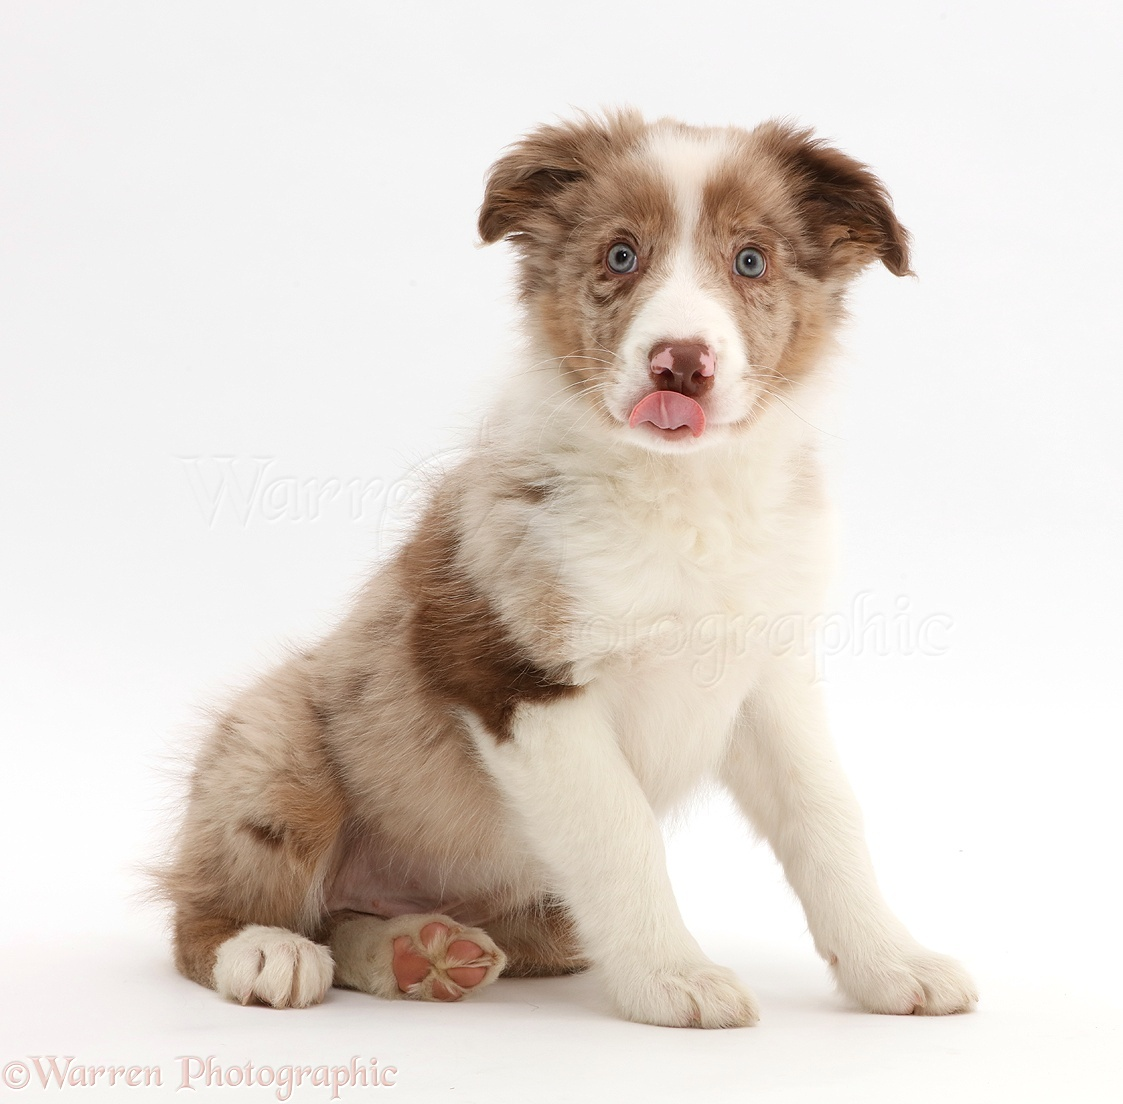 Dog Red Merle Border Collie Puppy Sitting Photo Wp44151